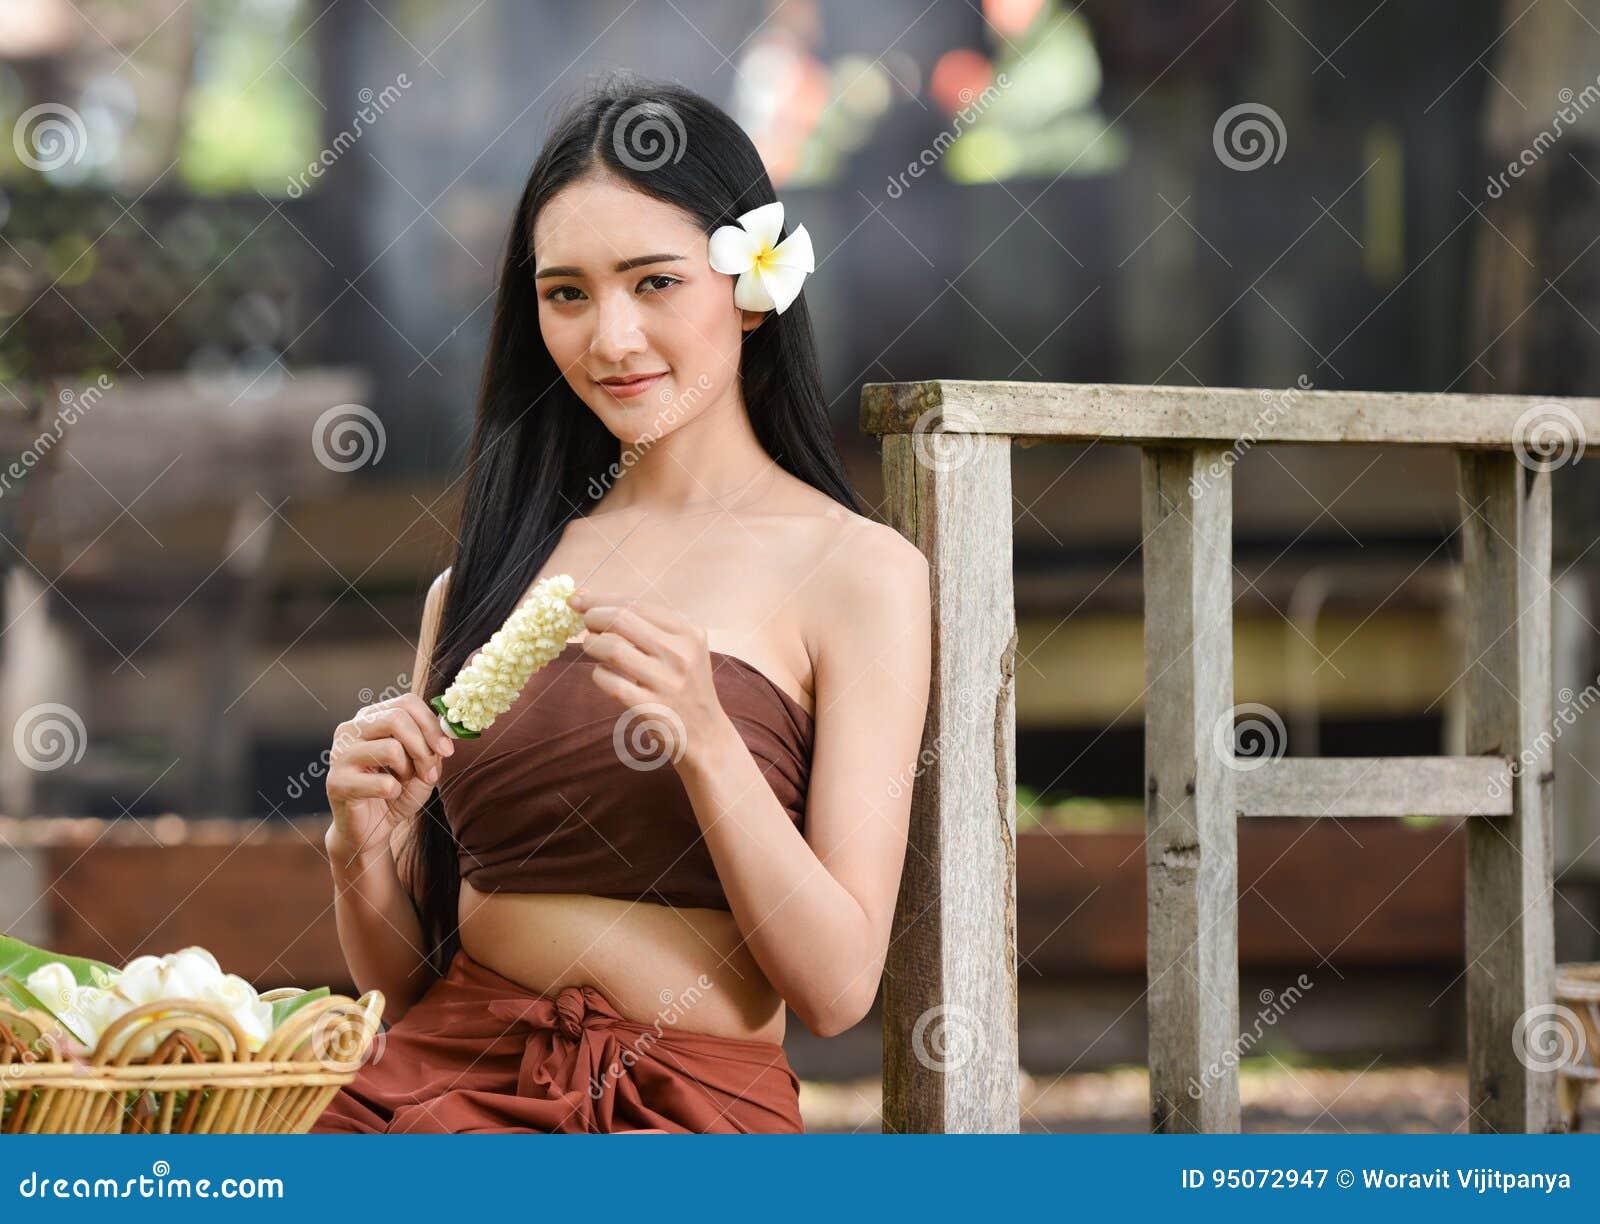 Thailand beautiful girl image-8291